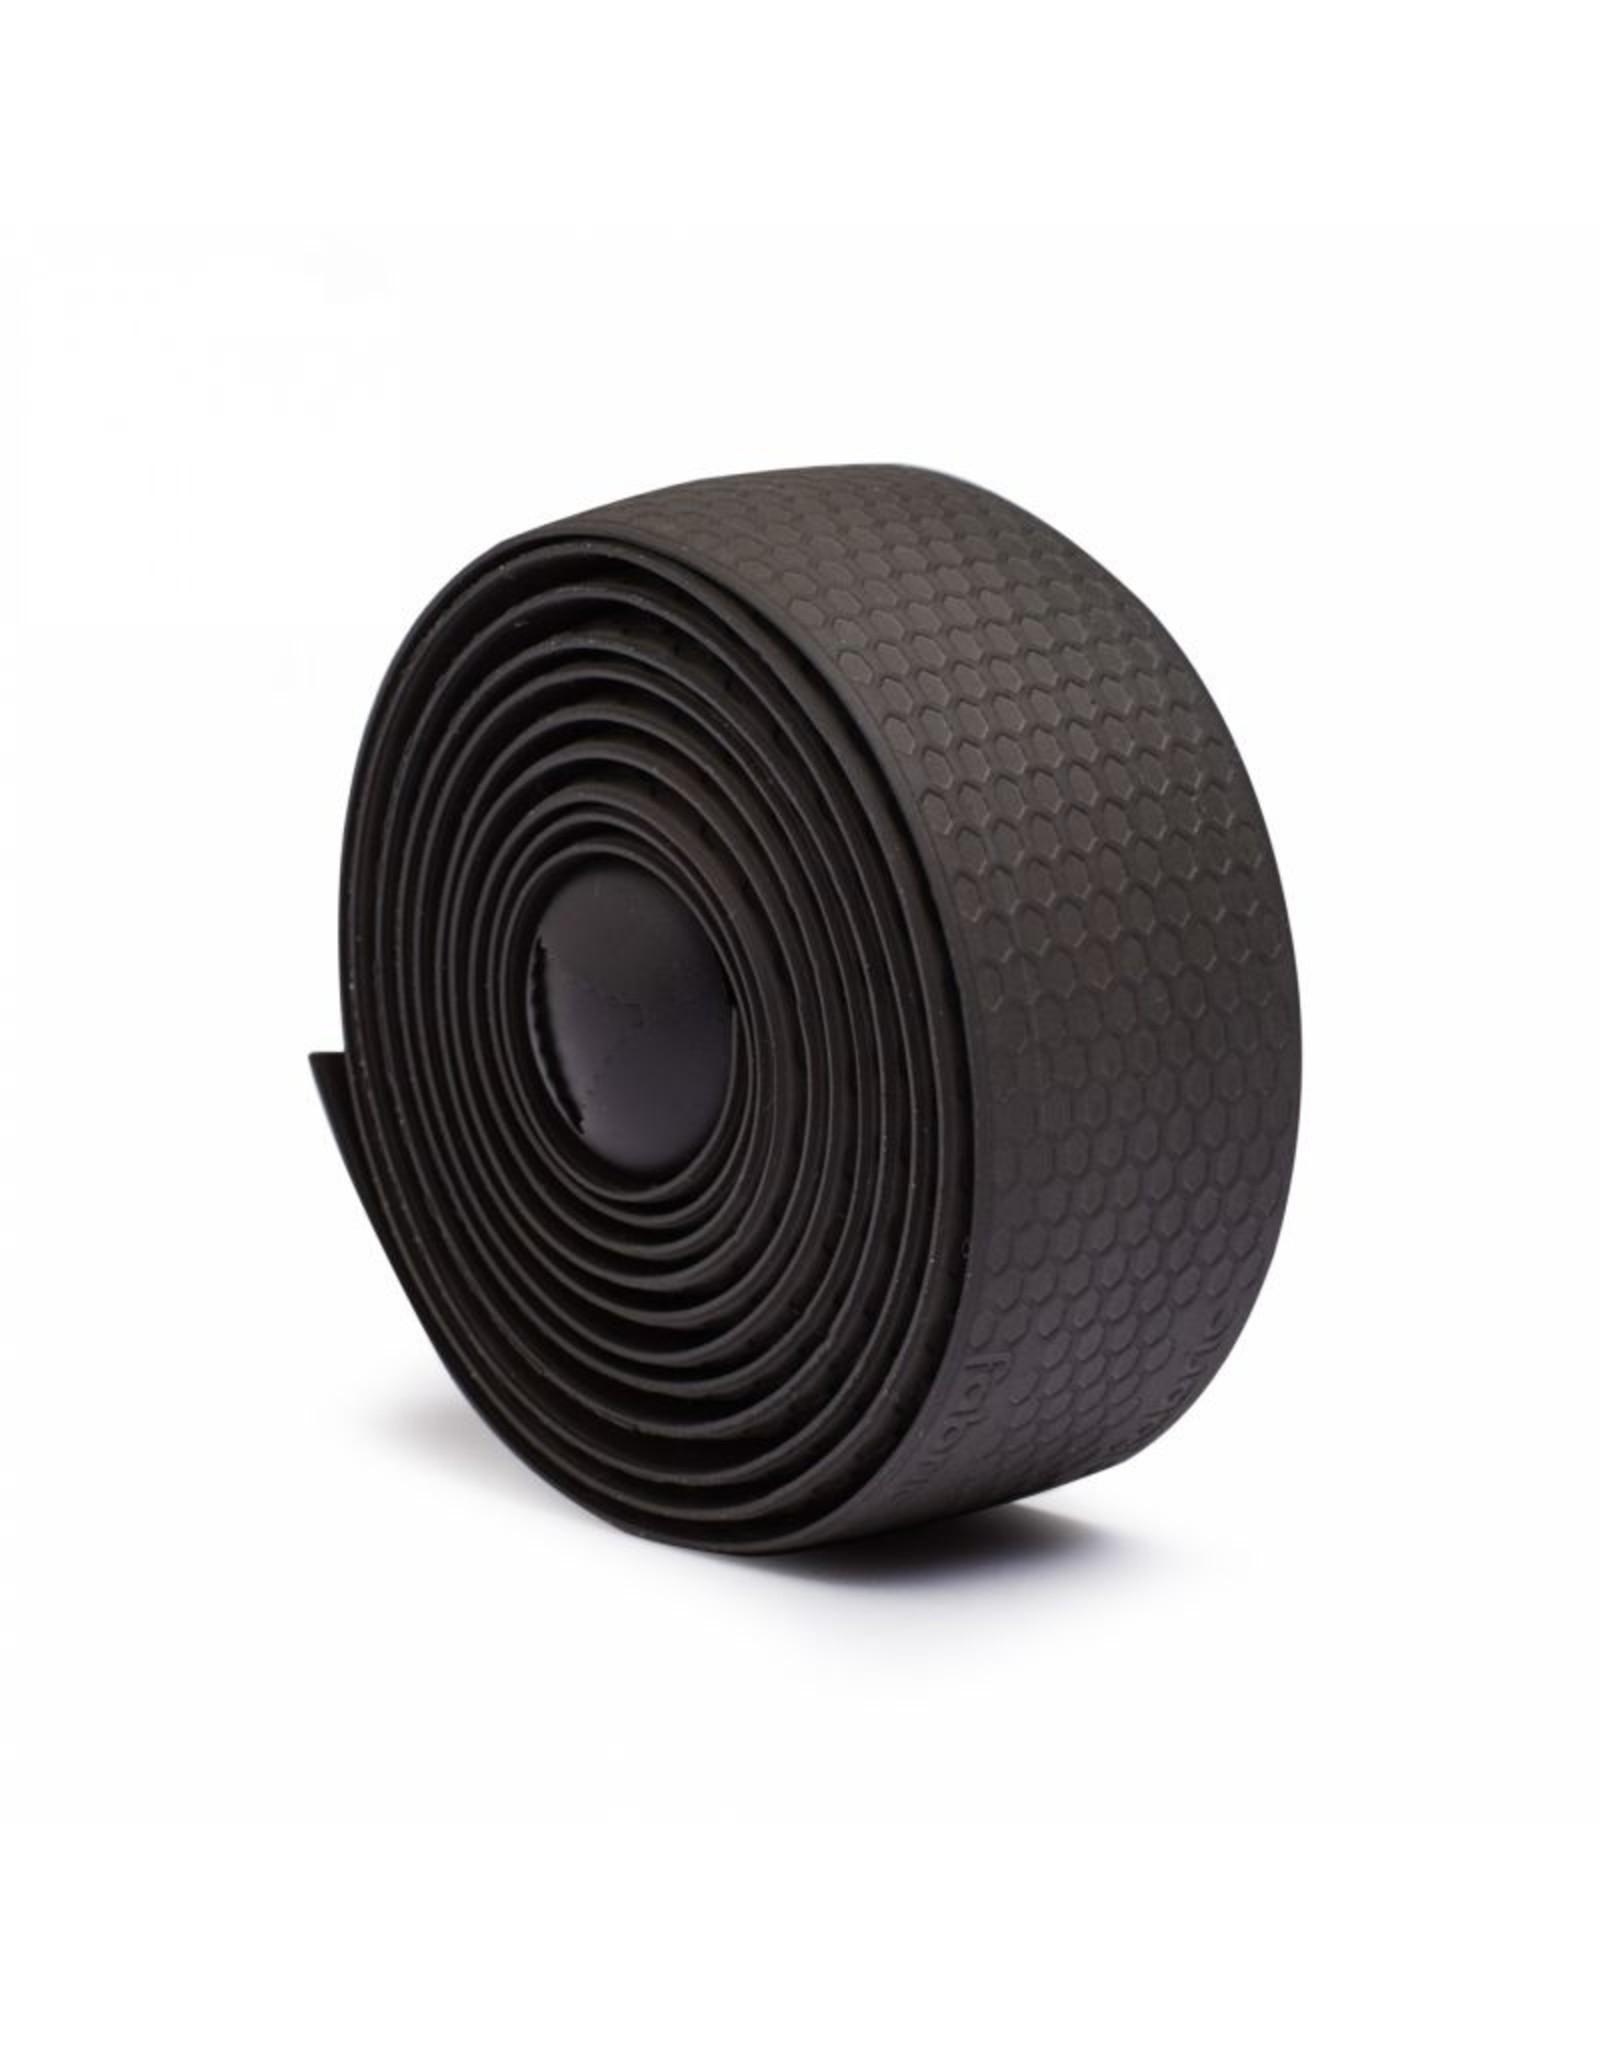 Fabric Guidoline Fabric Silicone tape